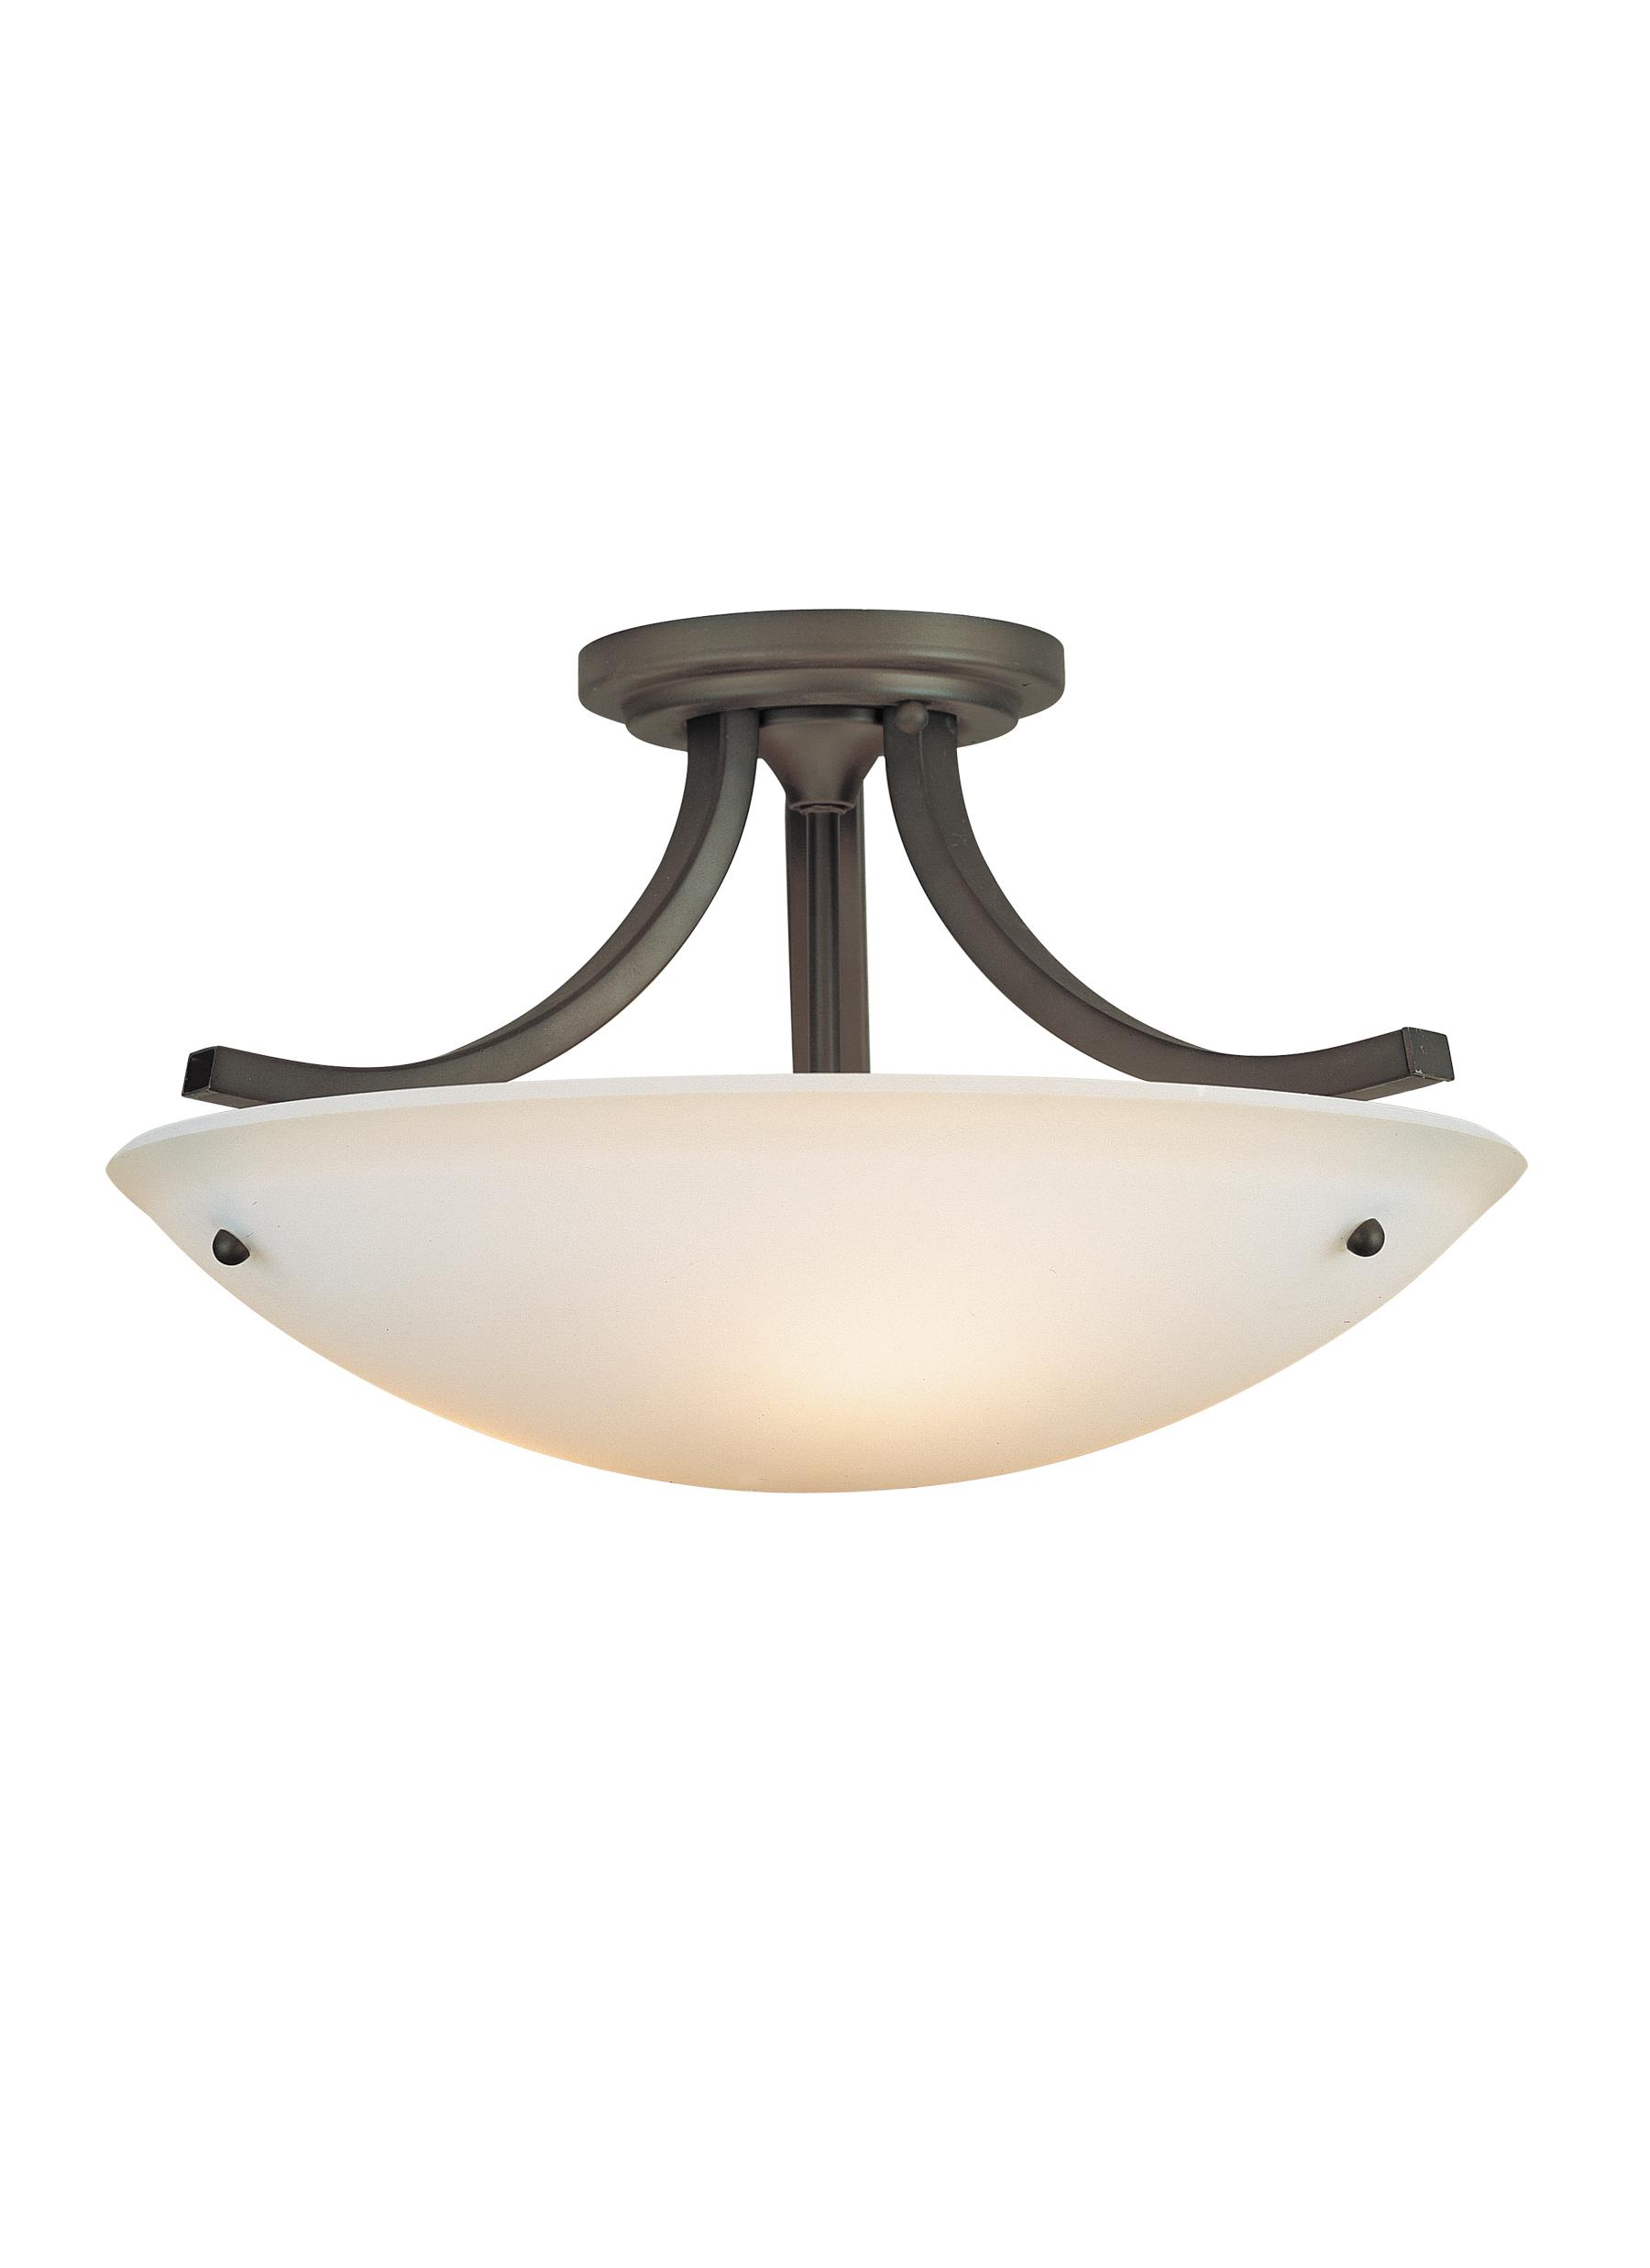 Sf189orb3 light indoor semi flush mountoil rubbed bronze loading zoom arubaitofo Images